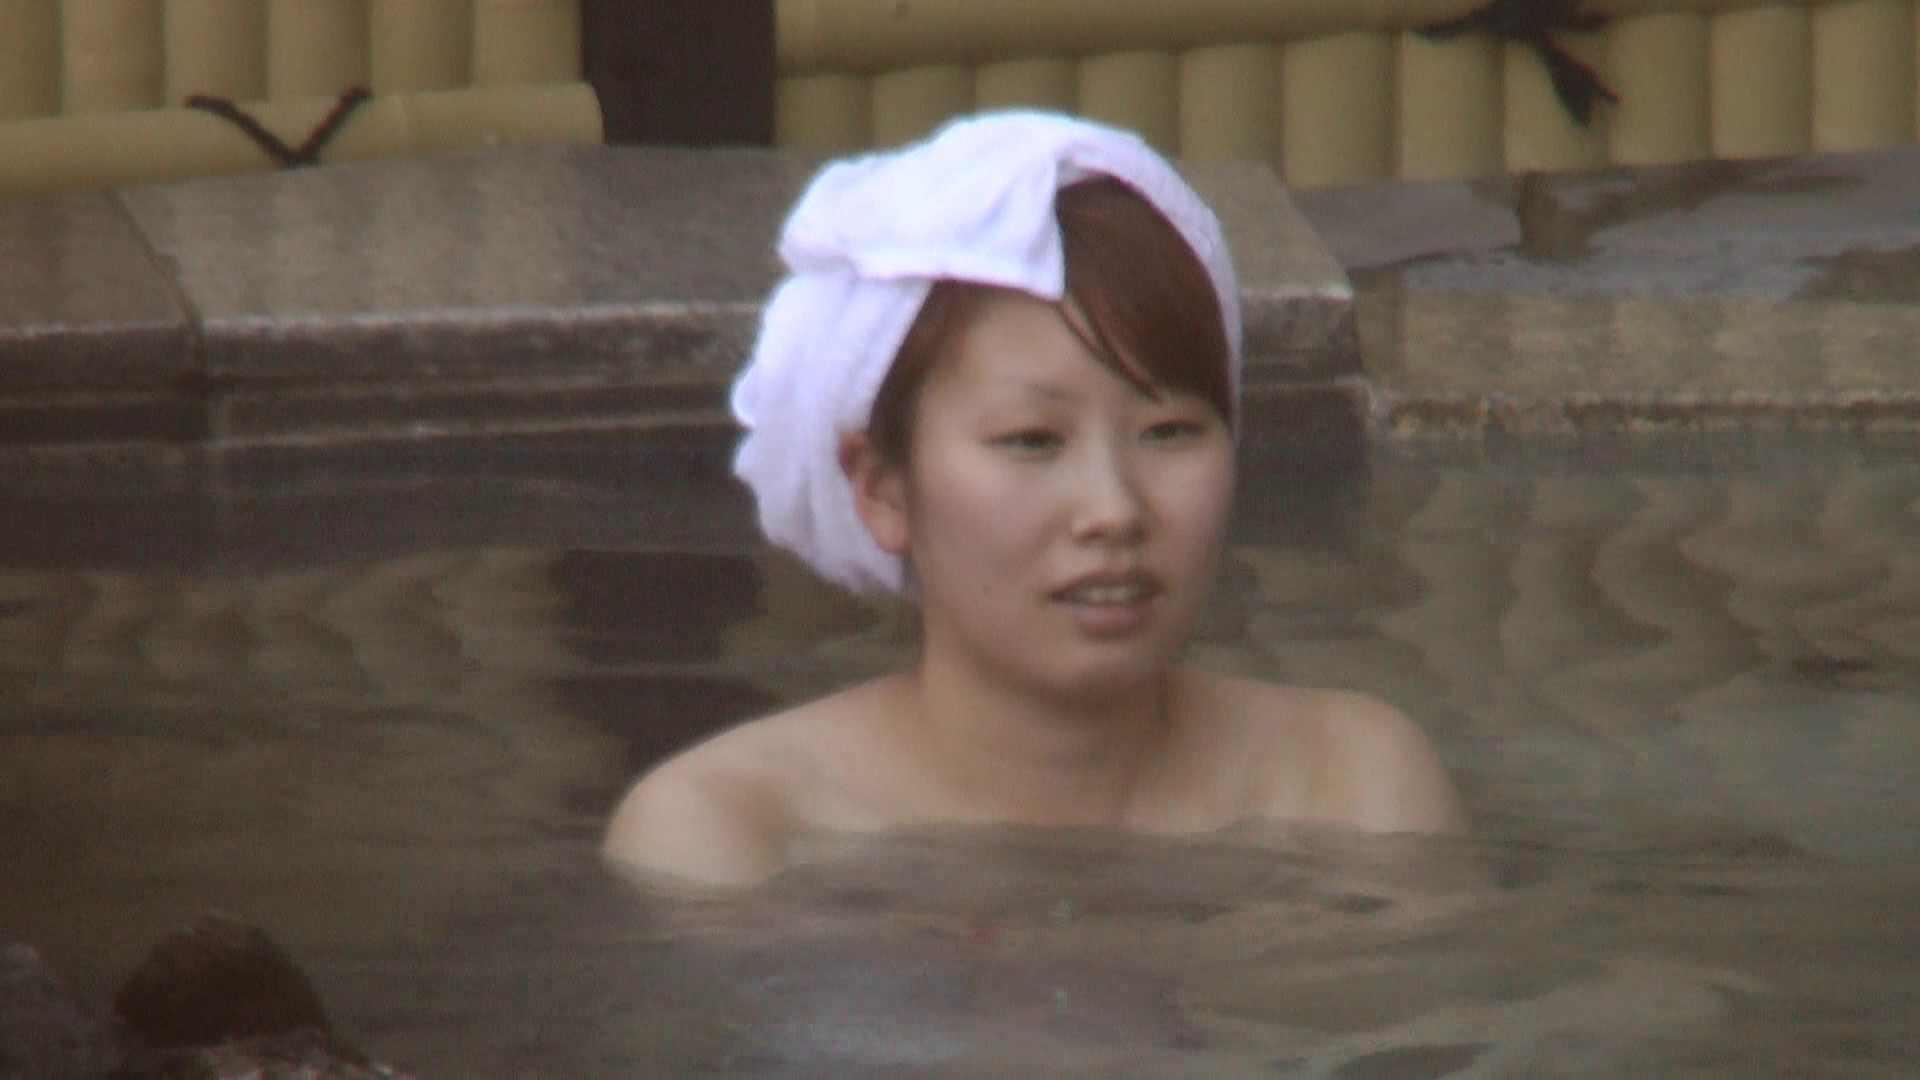 Aquaな露天風呂Vol.210 OL女体  49連発 27